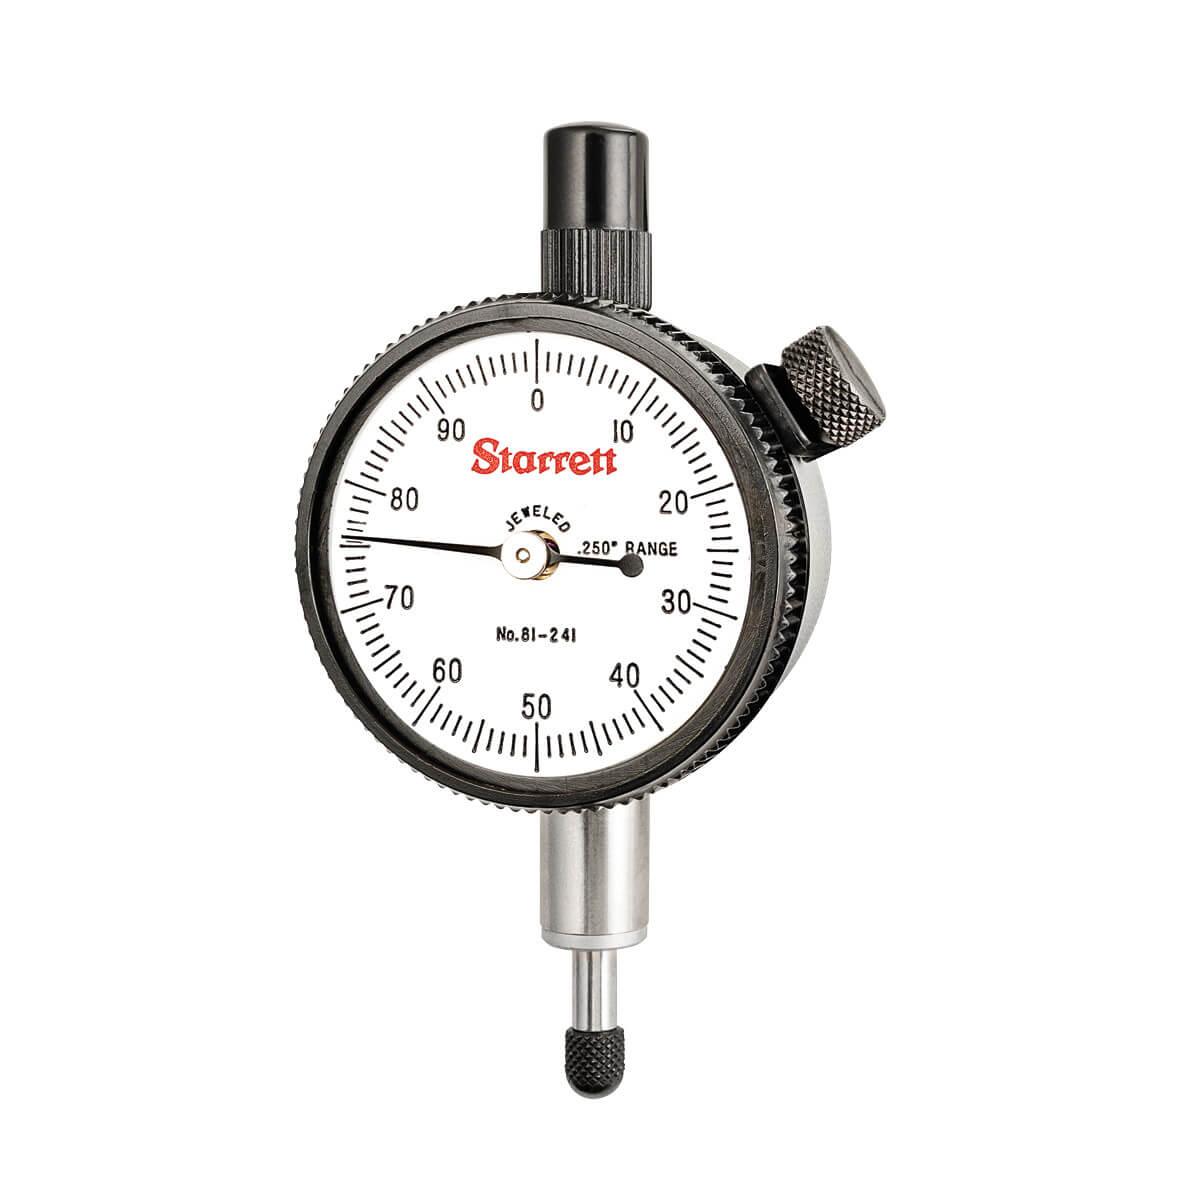 Starrett Dial Indicator >> Starrett 81 241j Dial Indicator 81 241j Willrich Precision